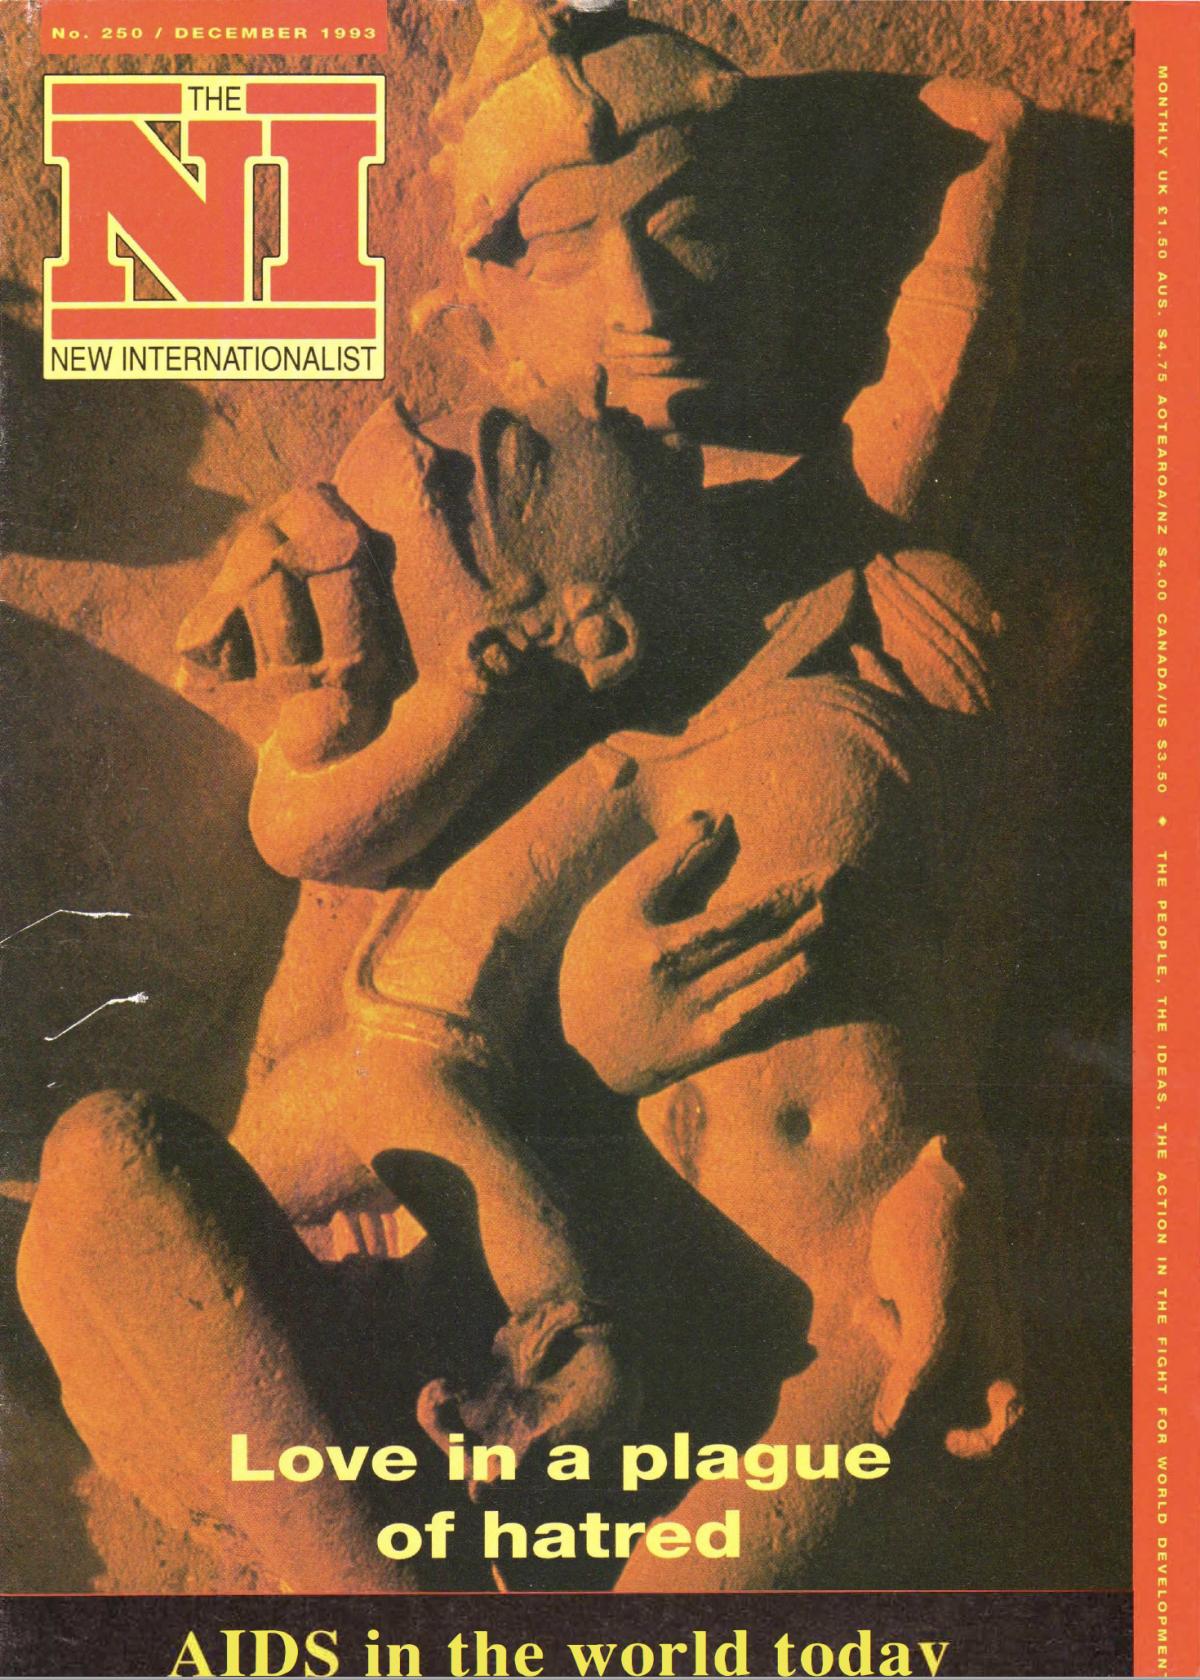 New Internationalist edited volume 250 (1993)